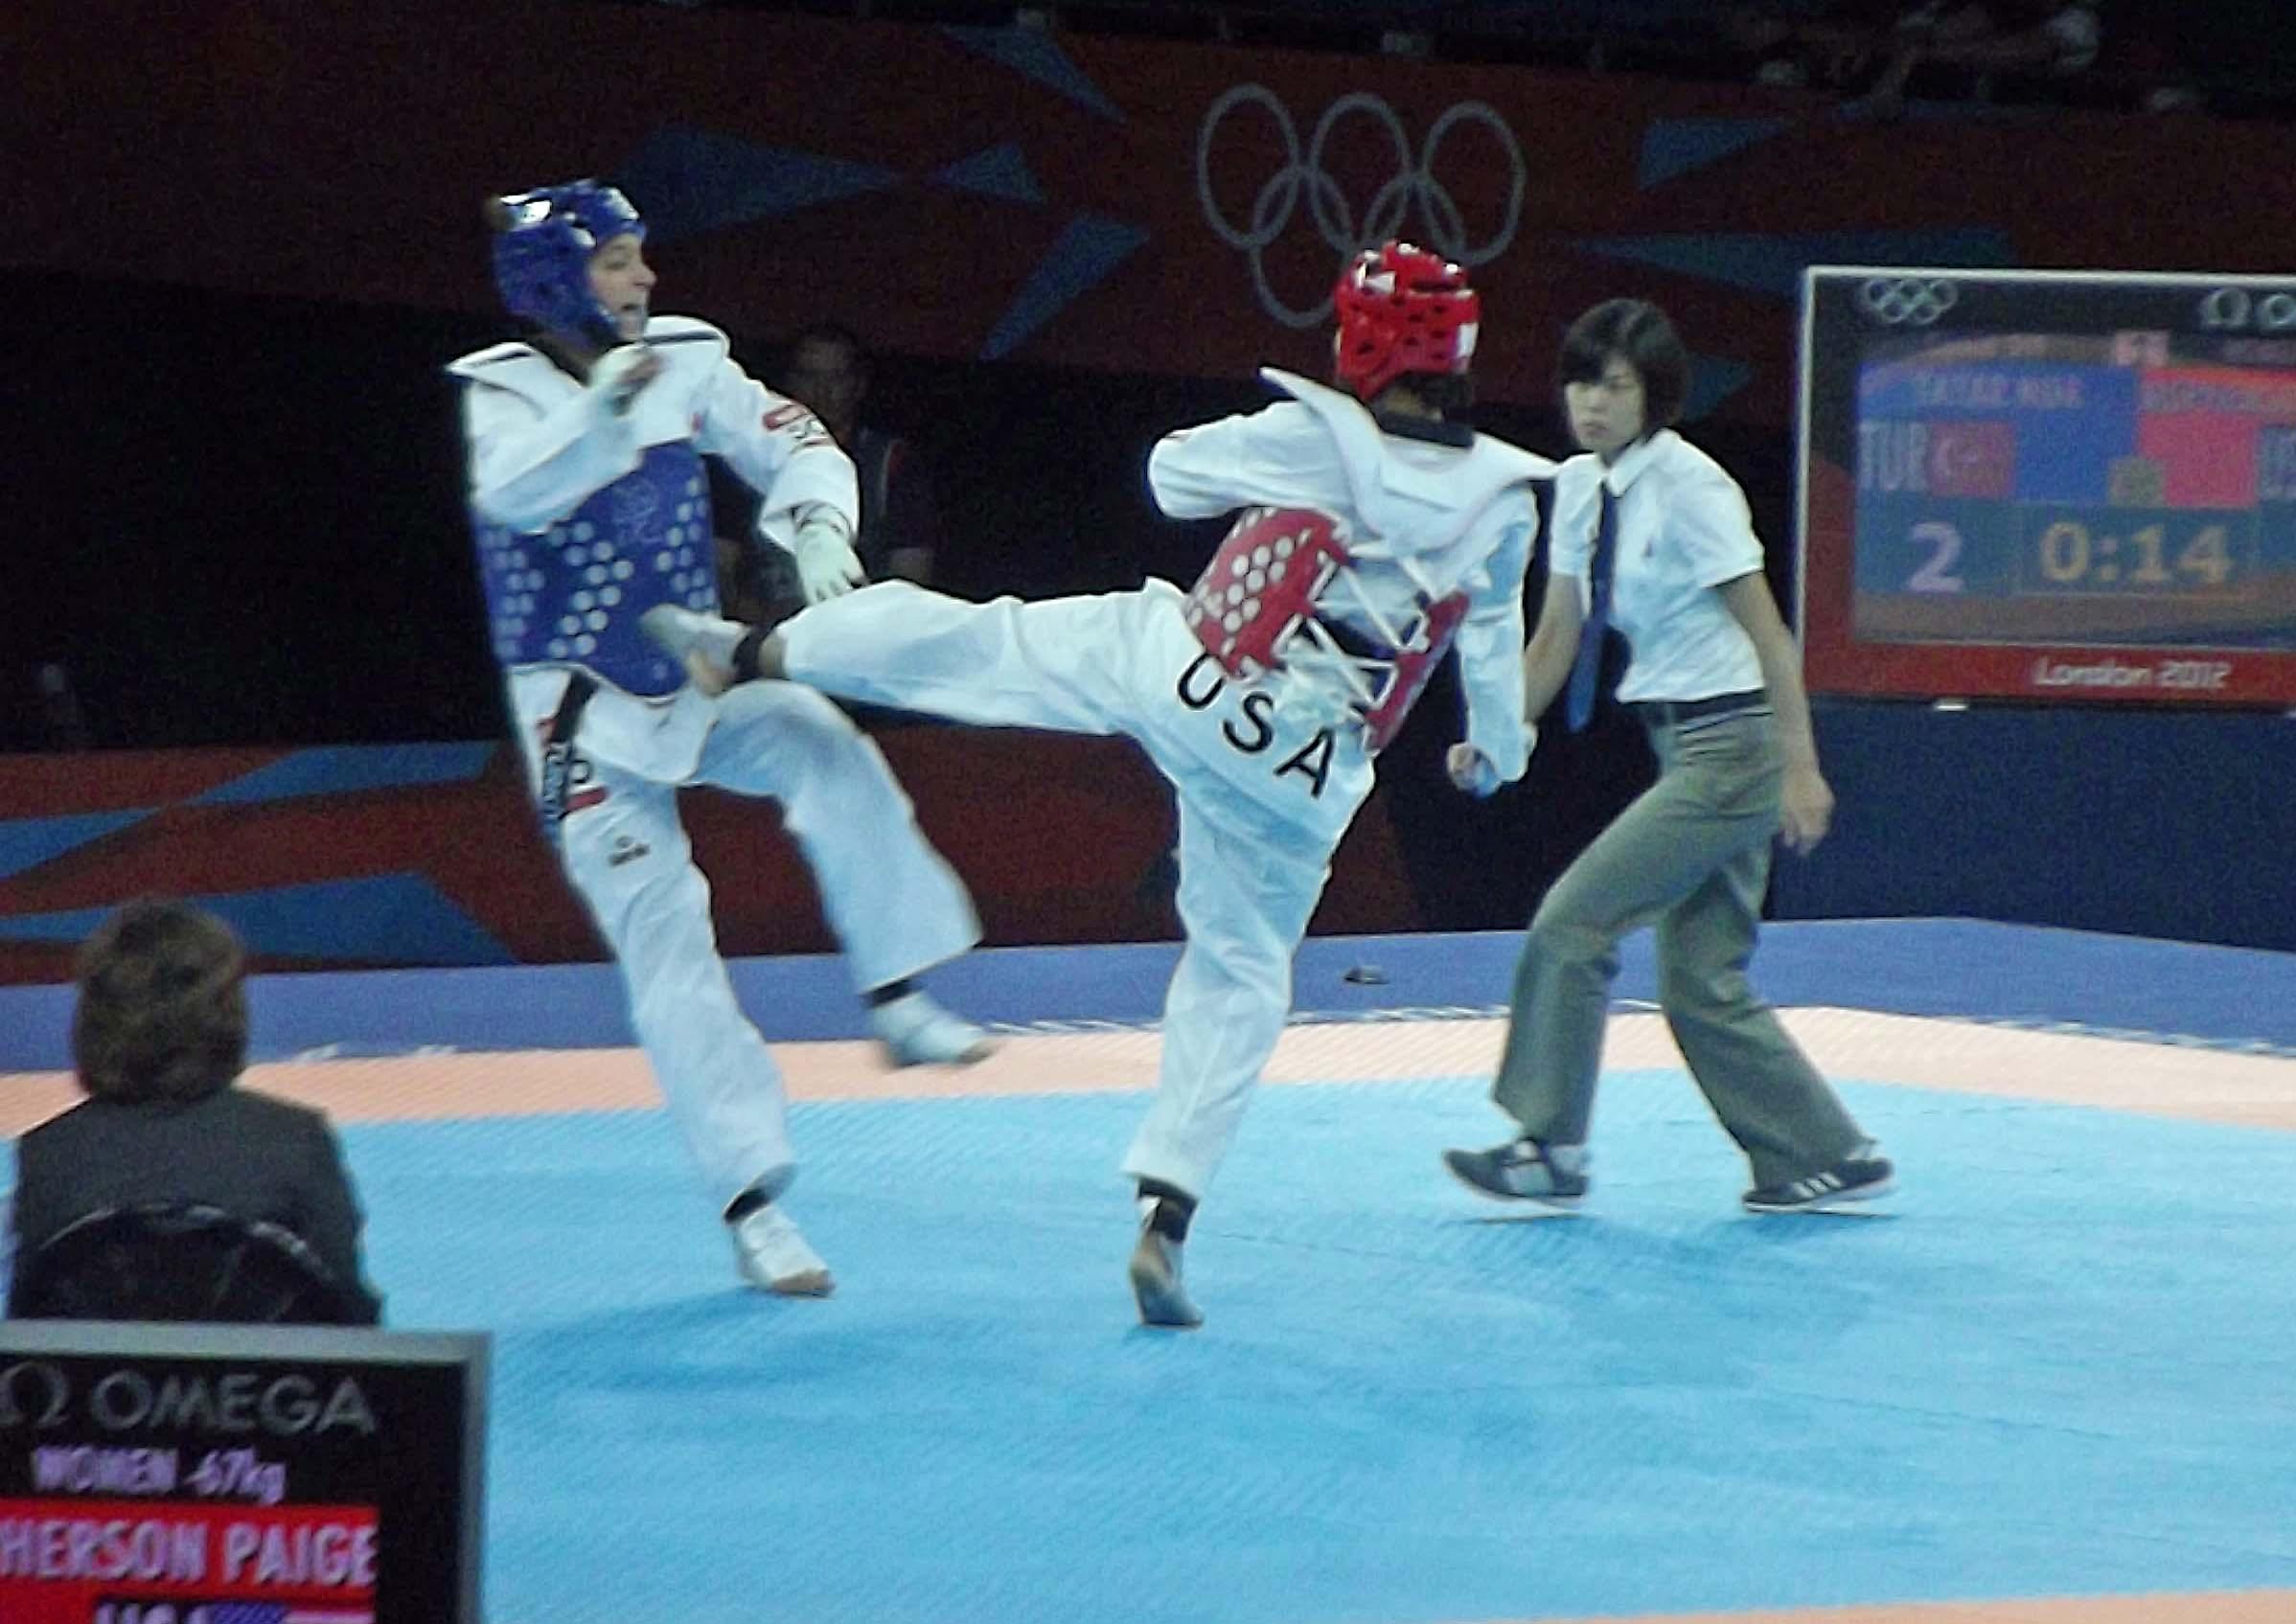 Two taekwondo competitors fighting